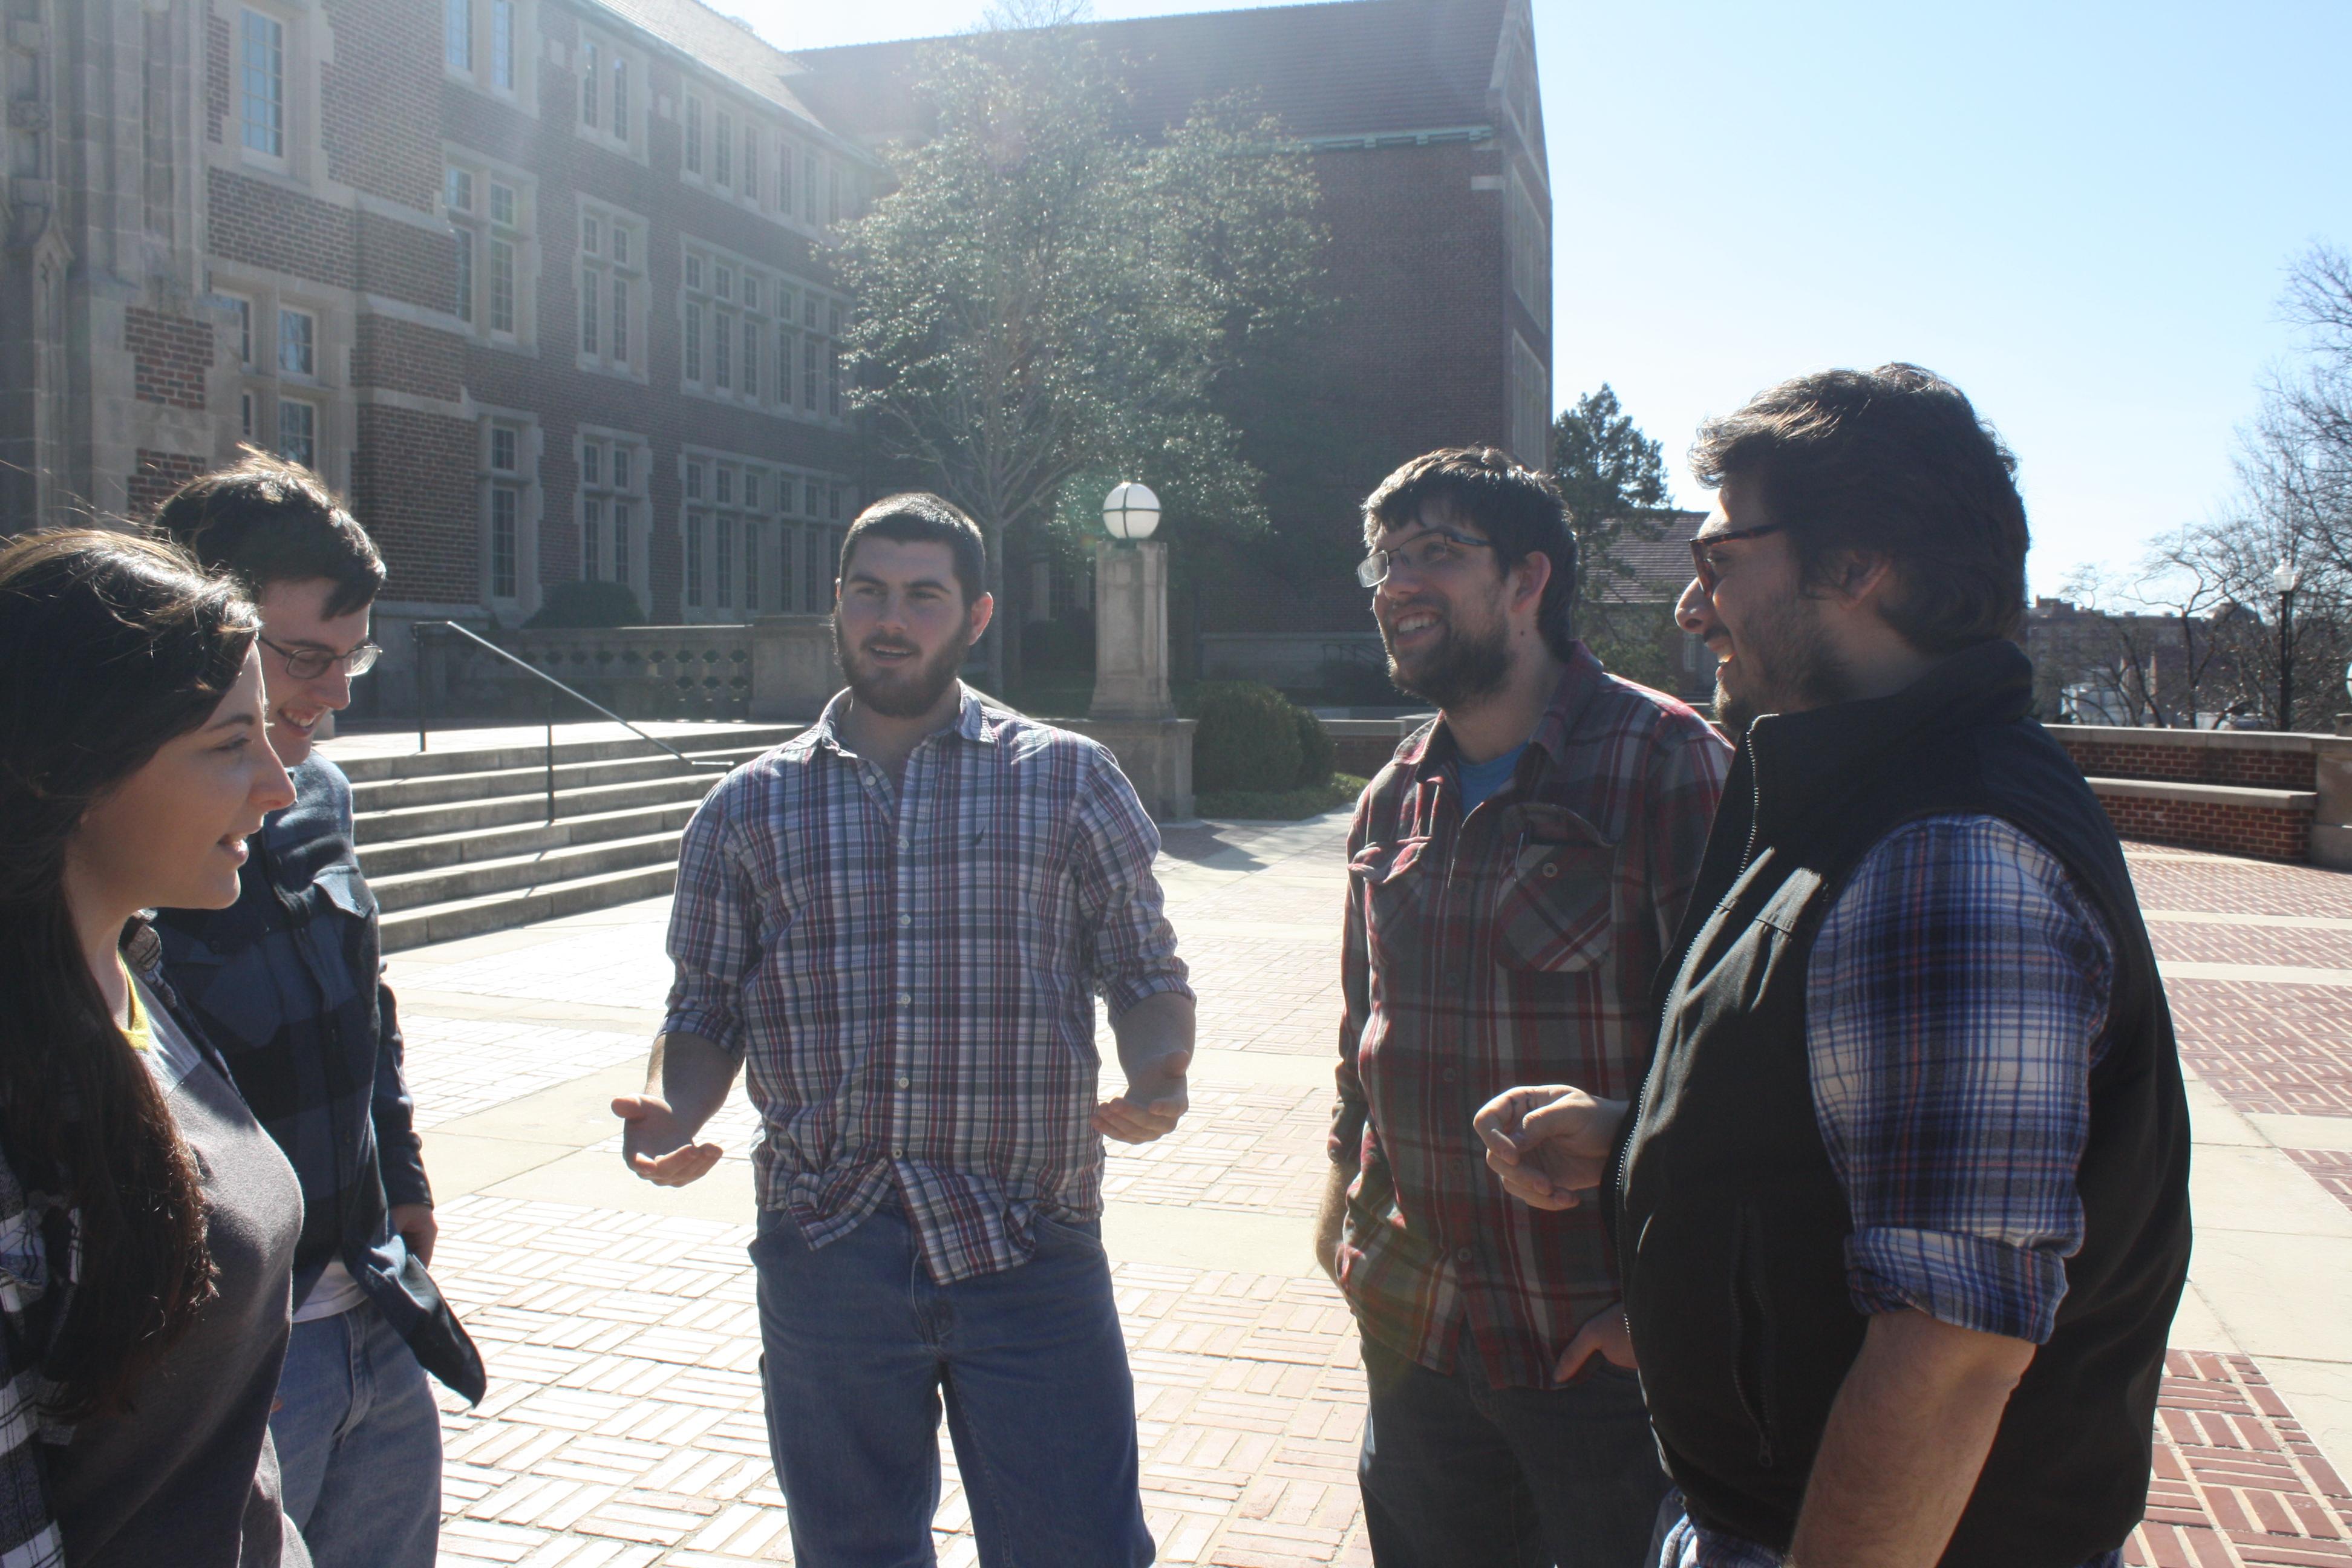 Darko Group, Spring 2016 (Left to Right): Morgan Higgins, William Sheffield, Caleb Garrett, Derek Cressy, Gavin Rustin